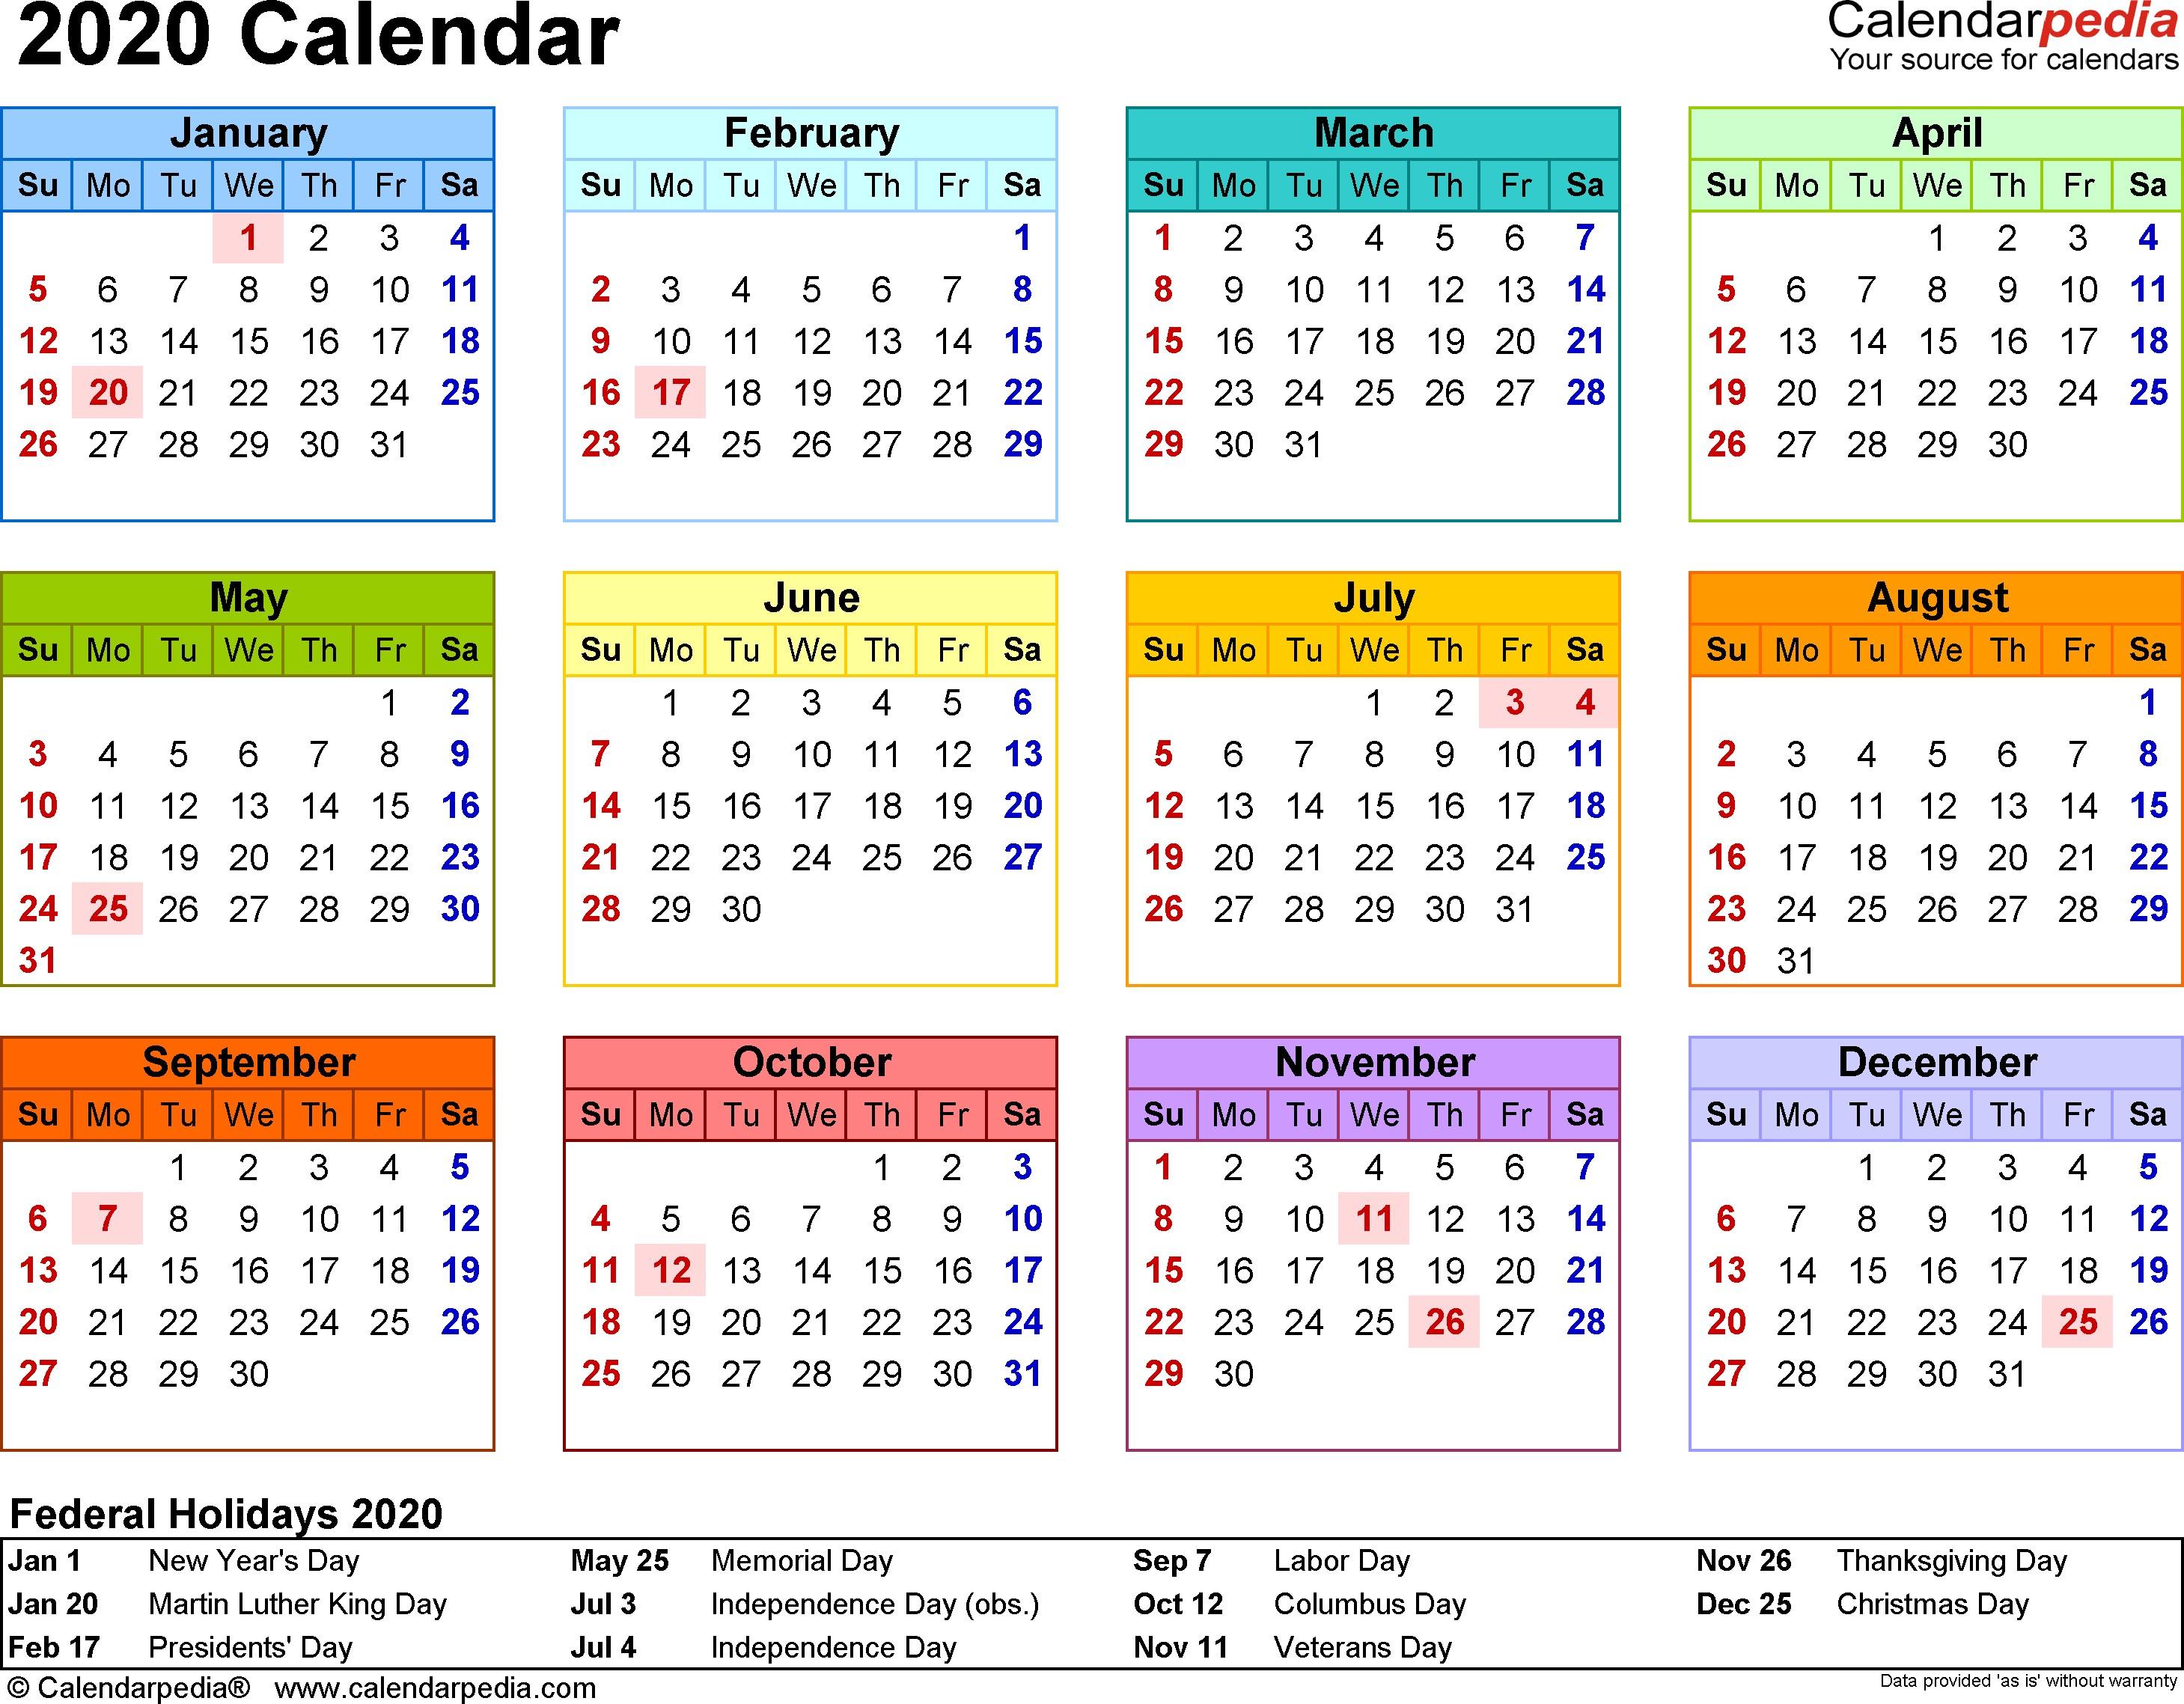 Free Printable Calendar for 2020 2020 Calendar 17 Free Printable Word Calendar Templates